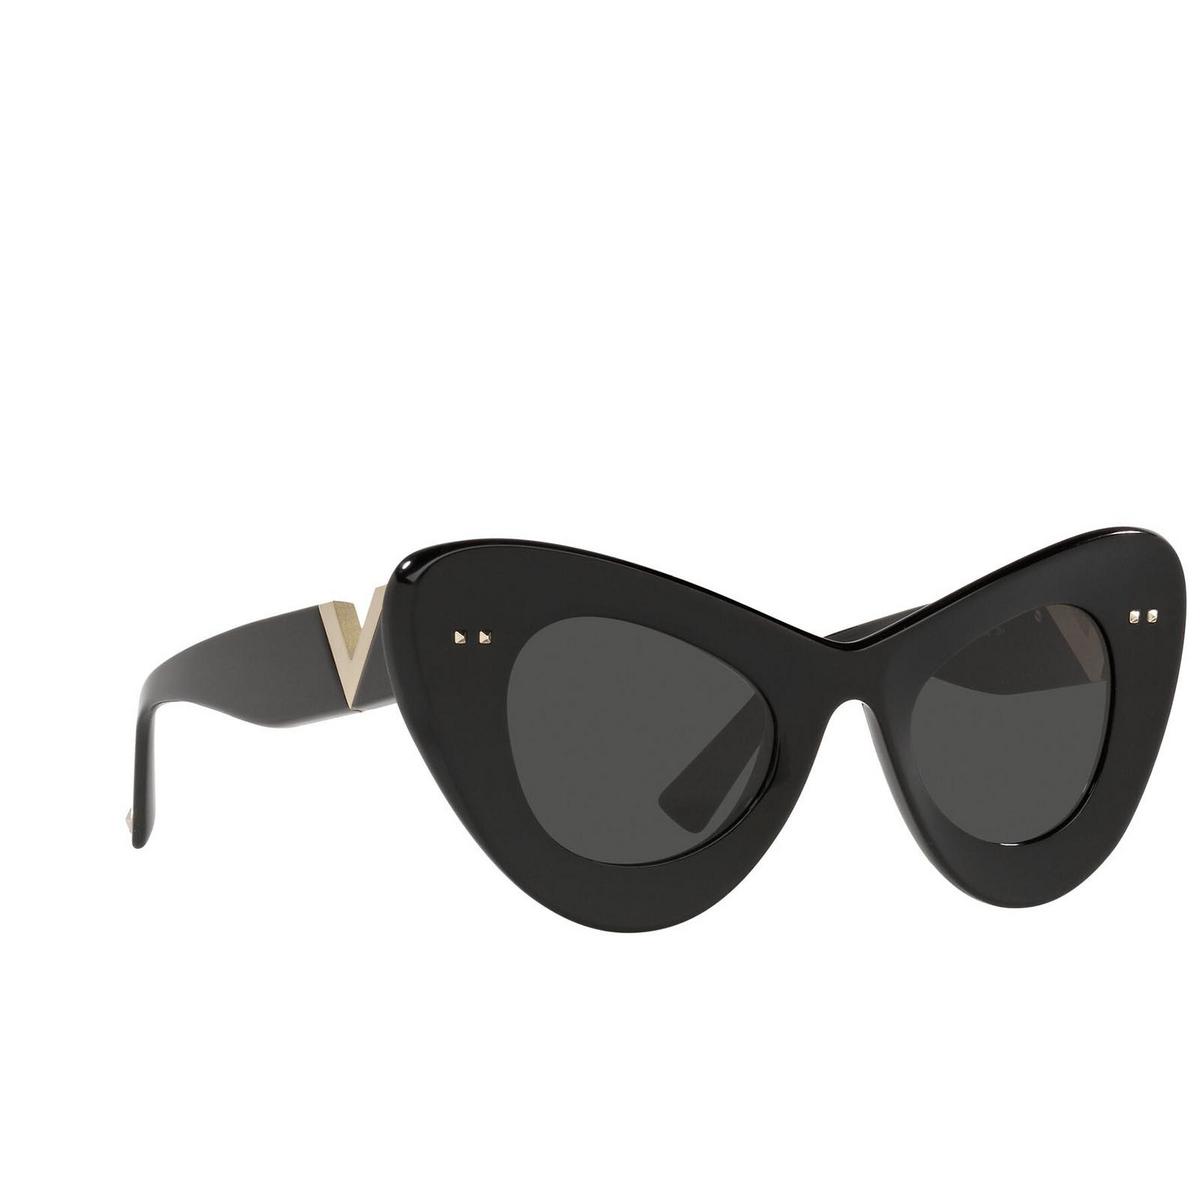 Valentino® Cat-eye Sunglasses: VA4090 color Black 500187.